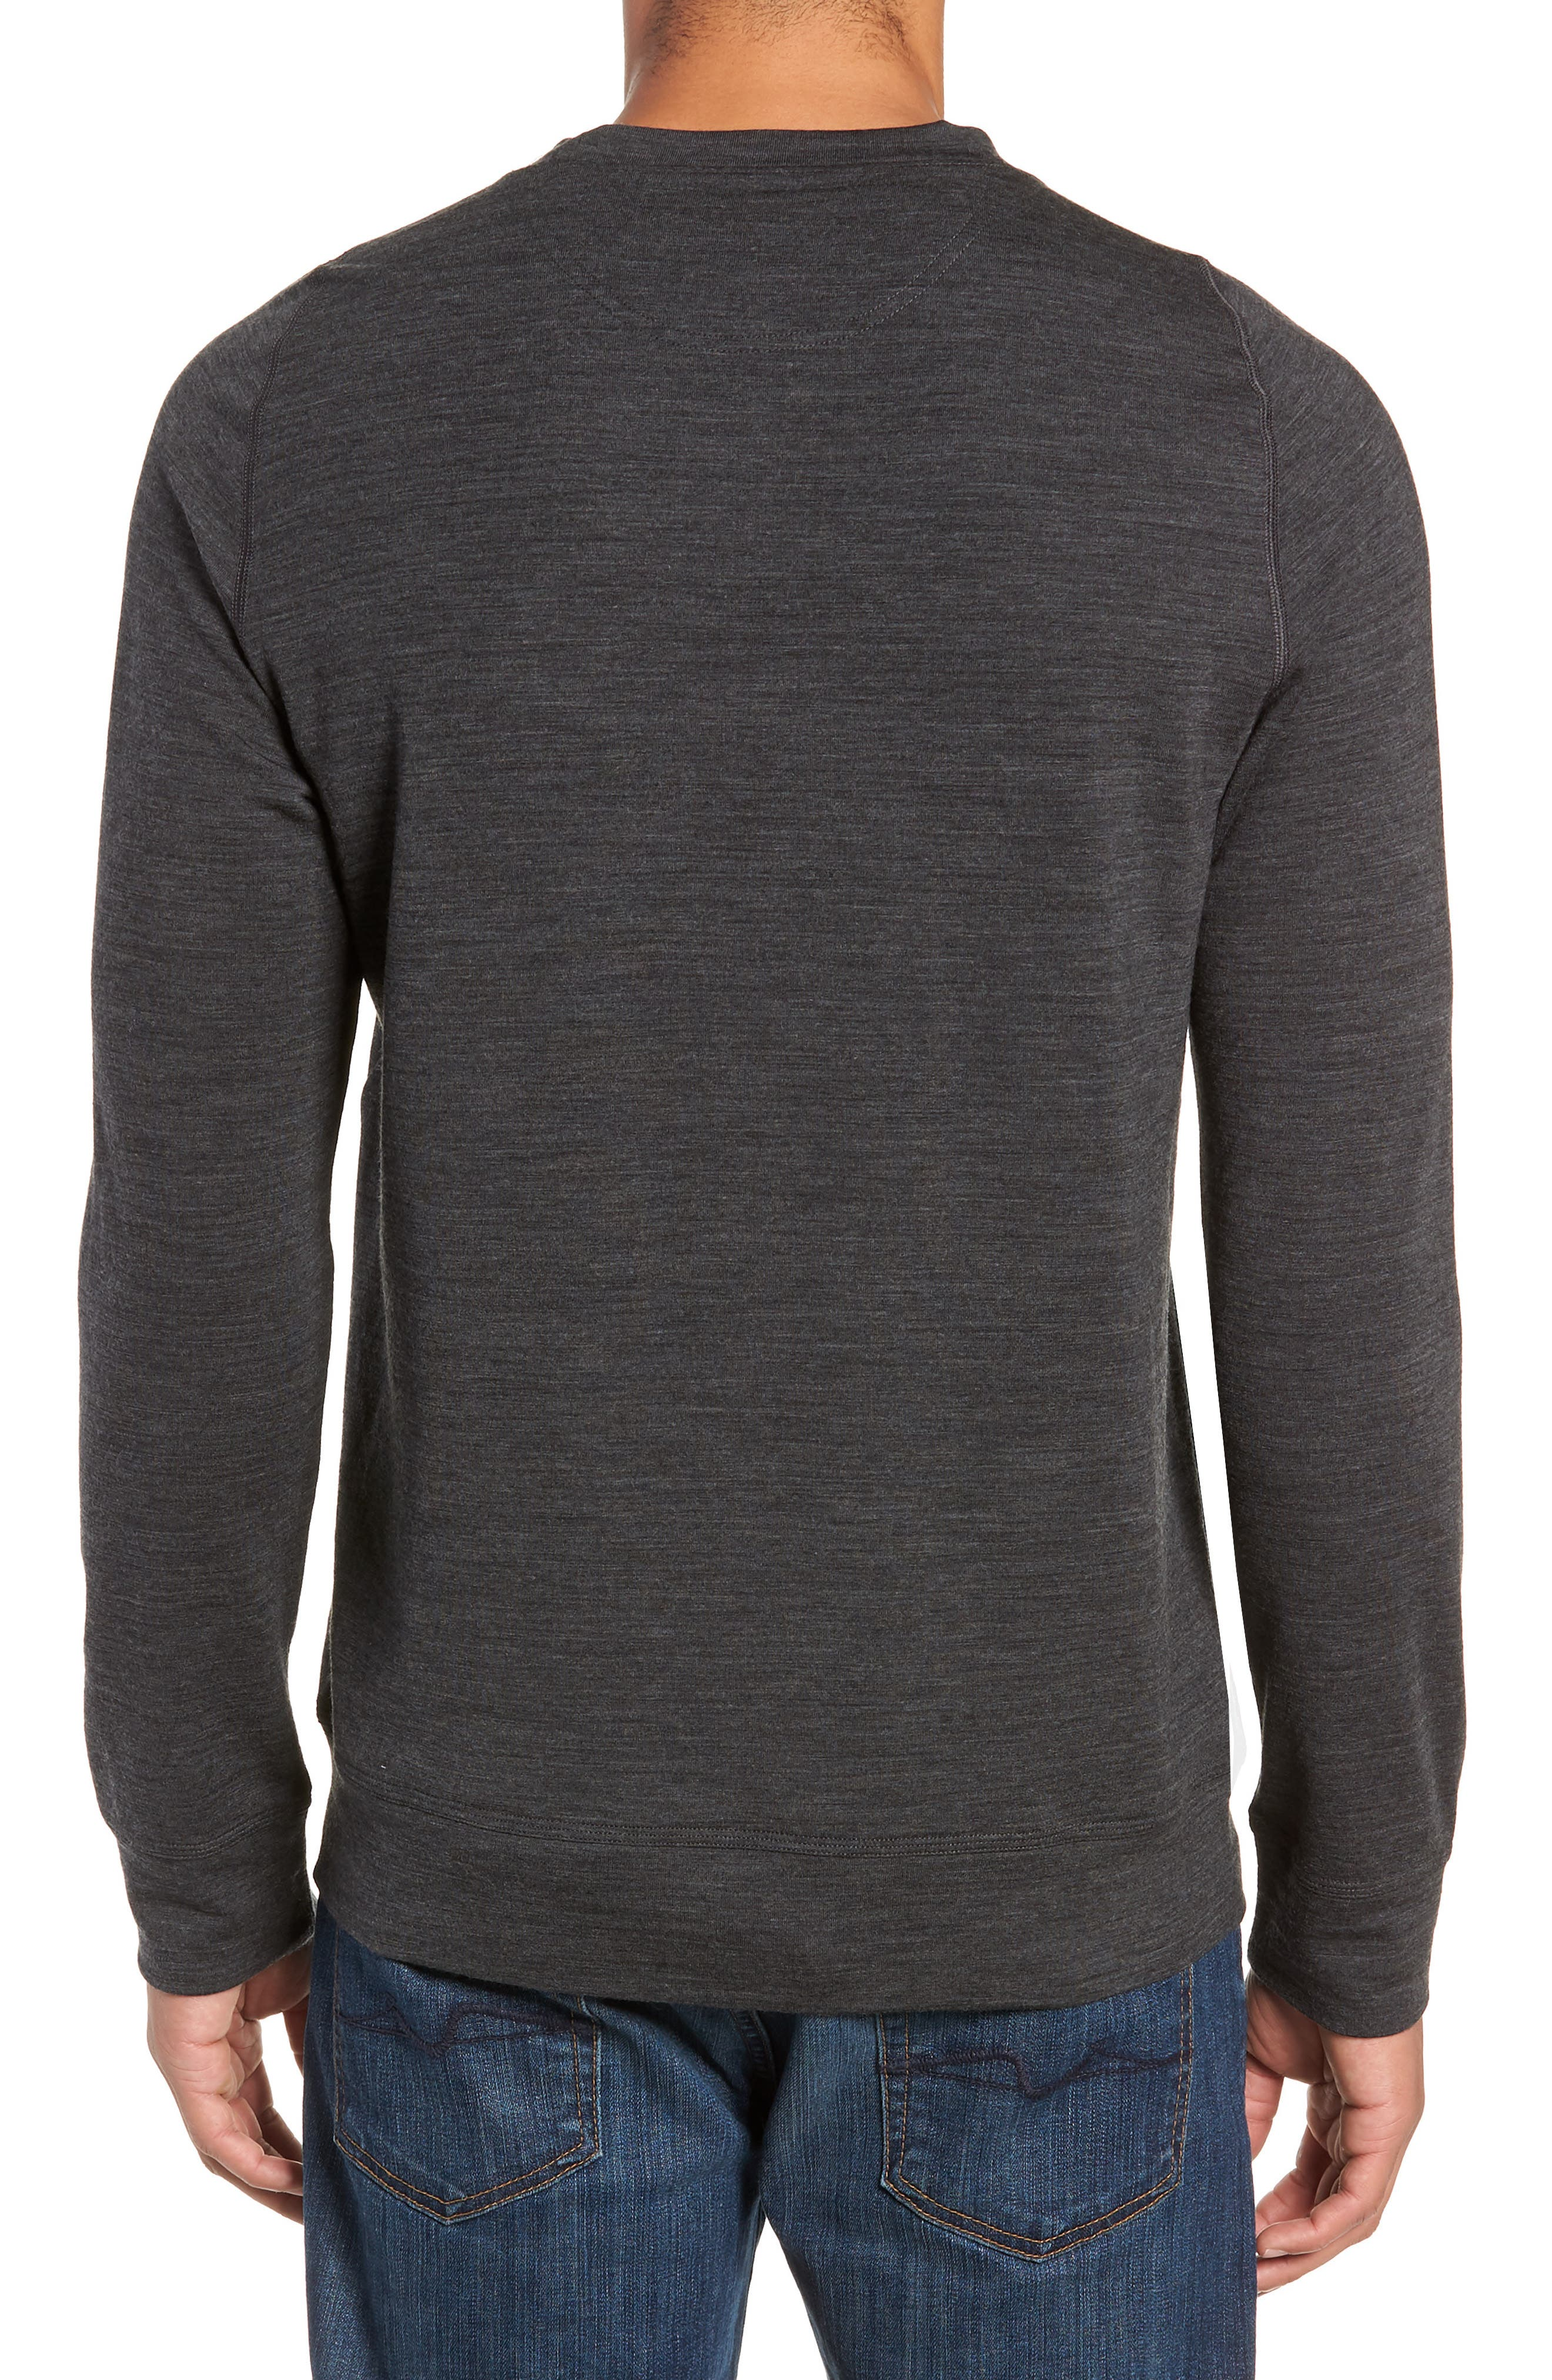 Shifter Merino Wool Blend Crewneck Sweater,                             Alternate thumbnail 2, color,                             JET HEATHER